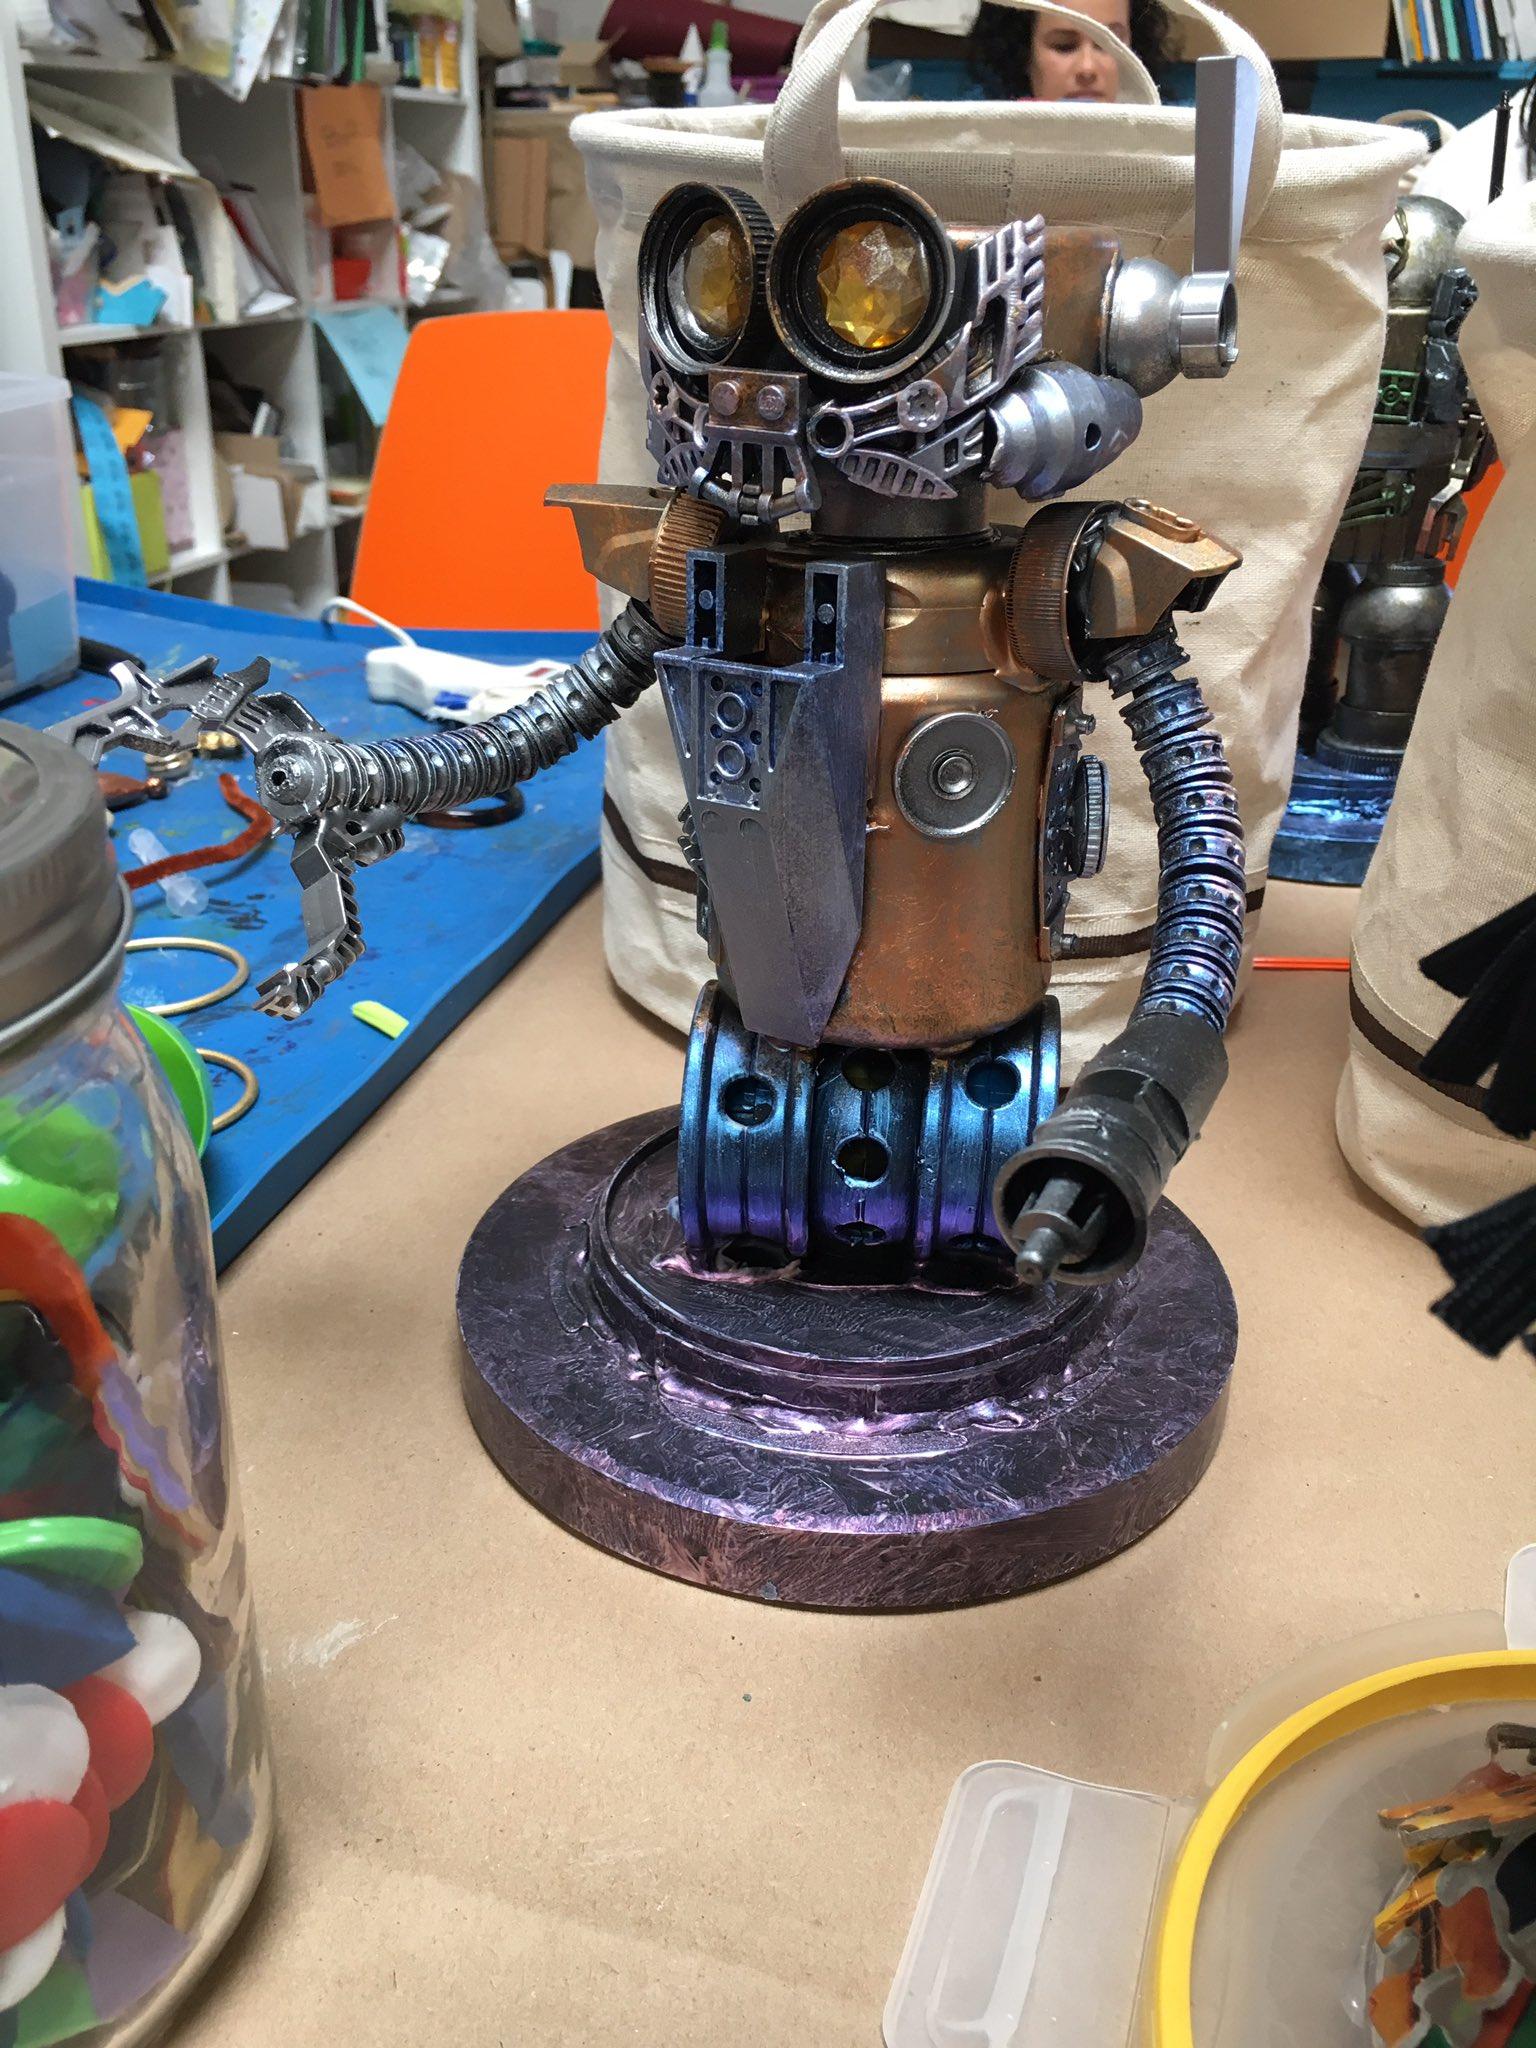 Getting creative today! #SCervice #robotbuilding https://t.co/kNUbfQnV61